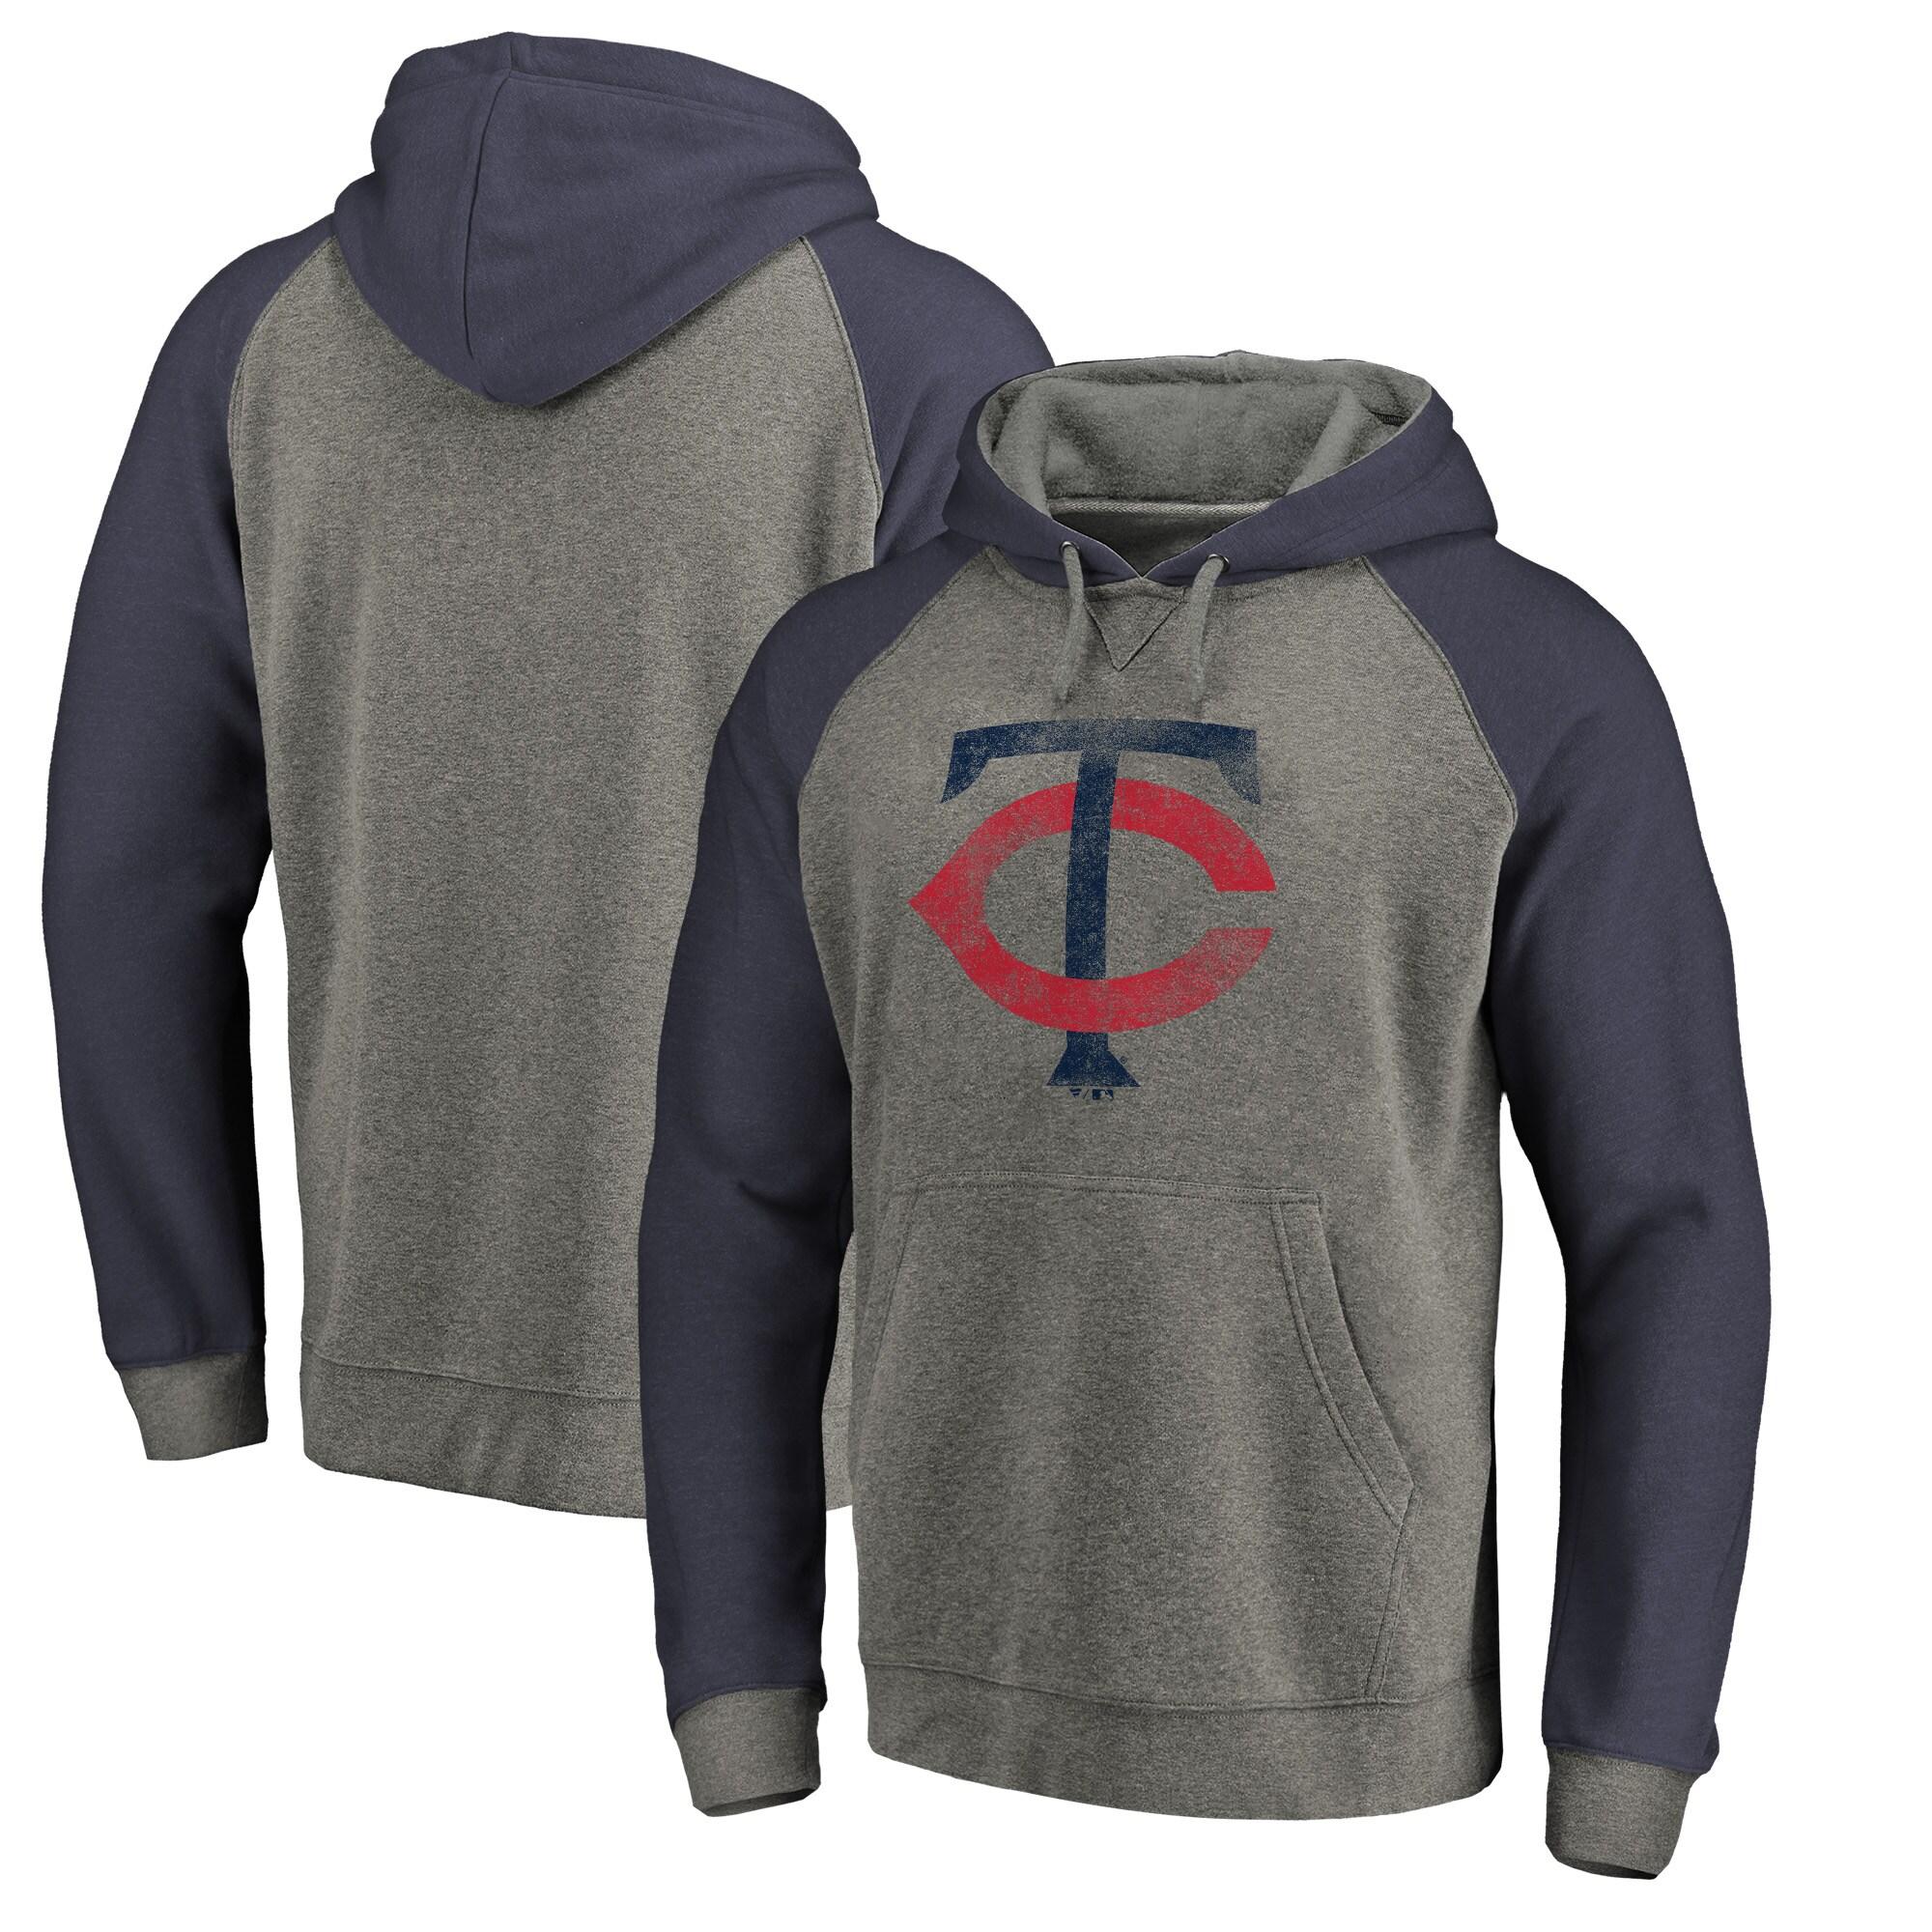 Minnesota Twins Fanatics Branded Distressed Team Logo Tri-Blend Raglan Pullover Hoodie - Gray/Navy